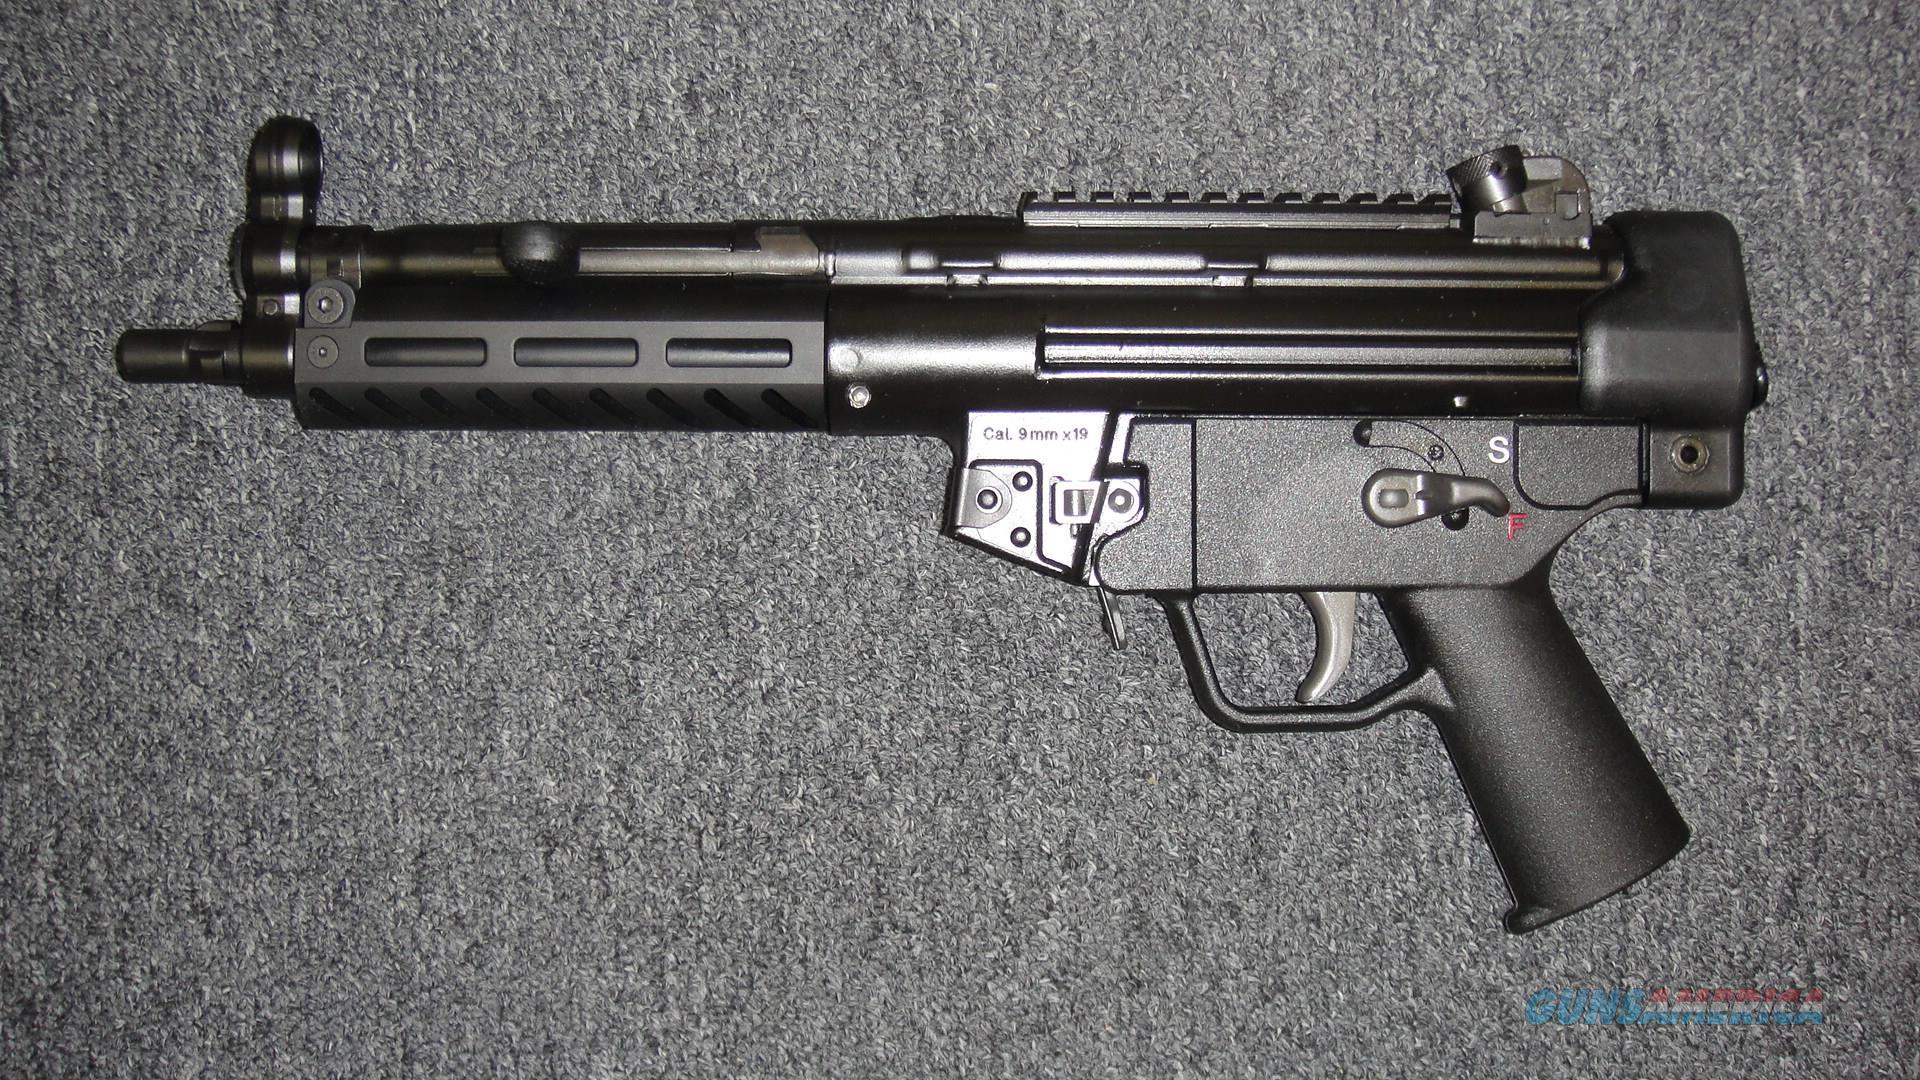 PTR 9C 9mm (MP5 Clone)  Guns > Rifles > PTR Rifles